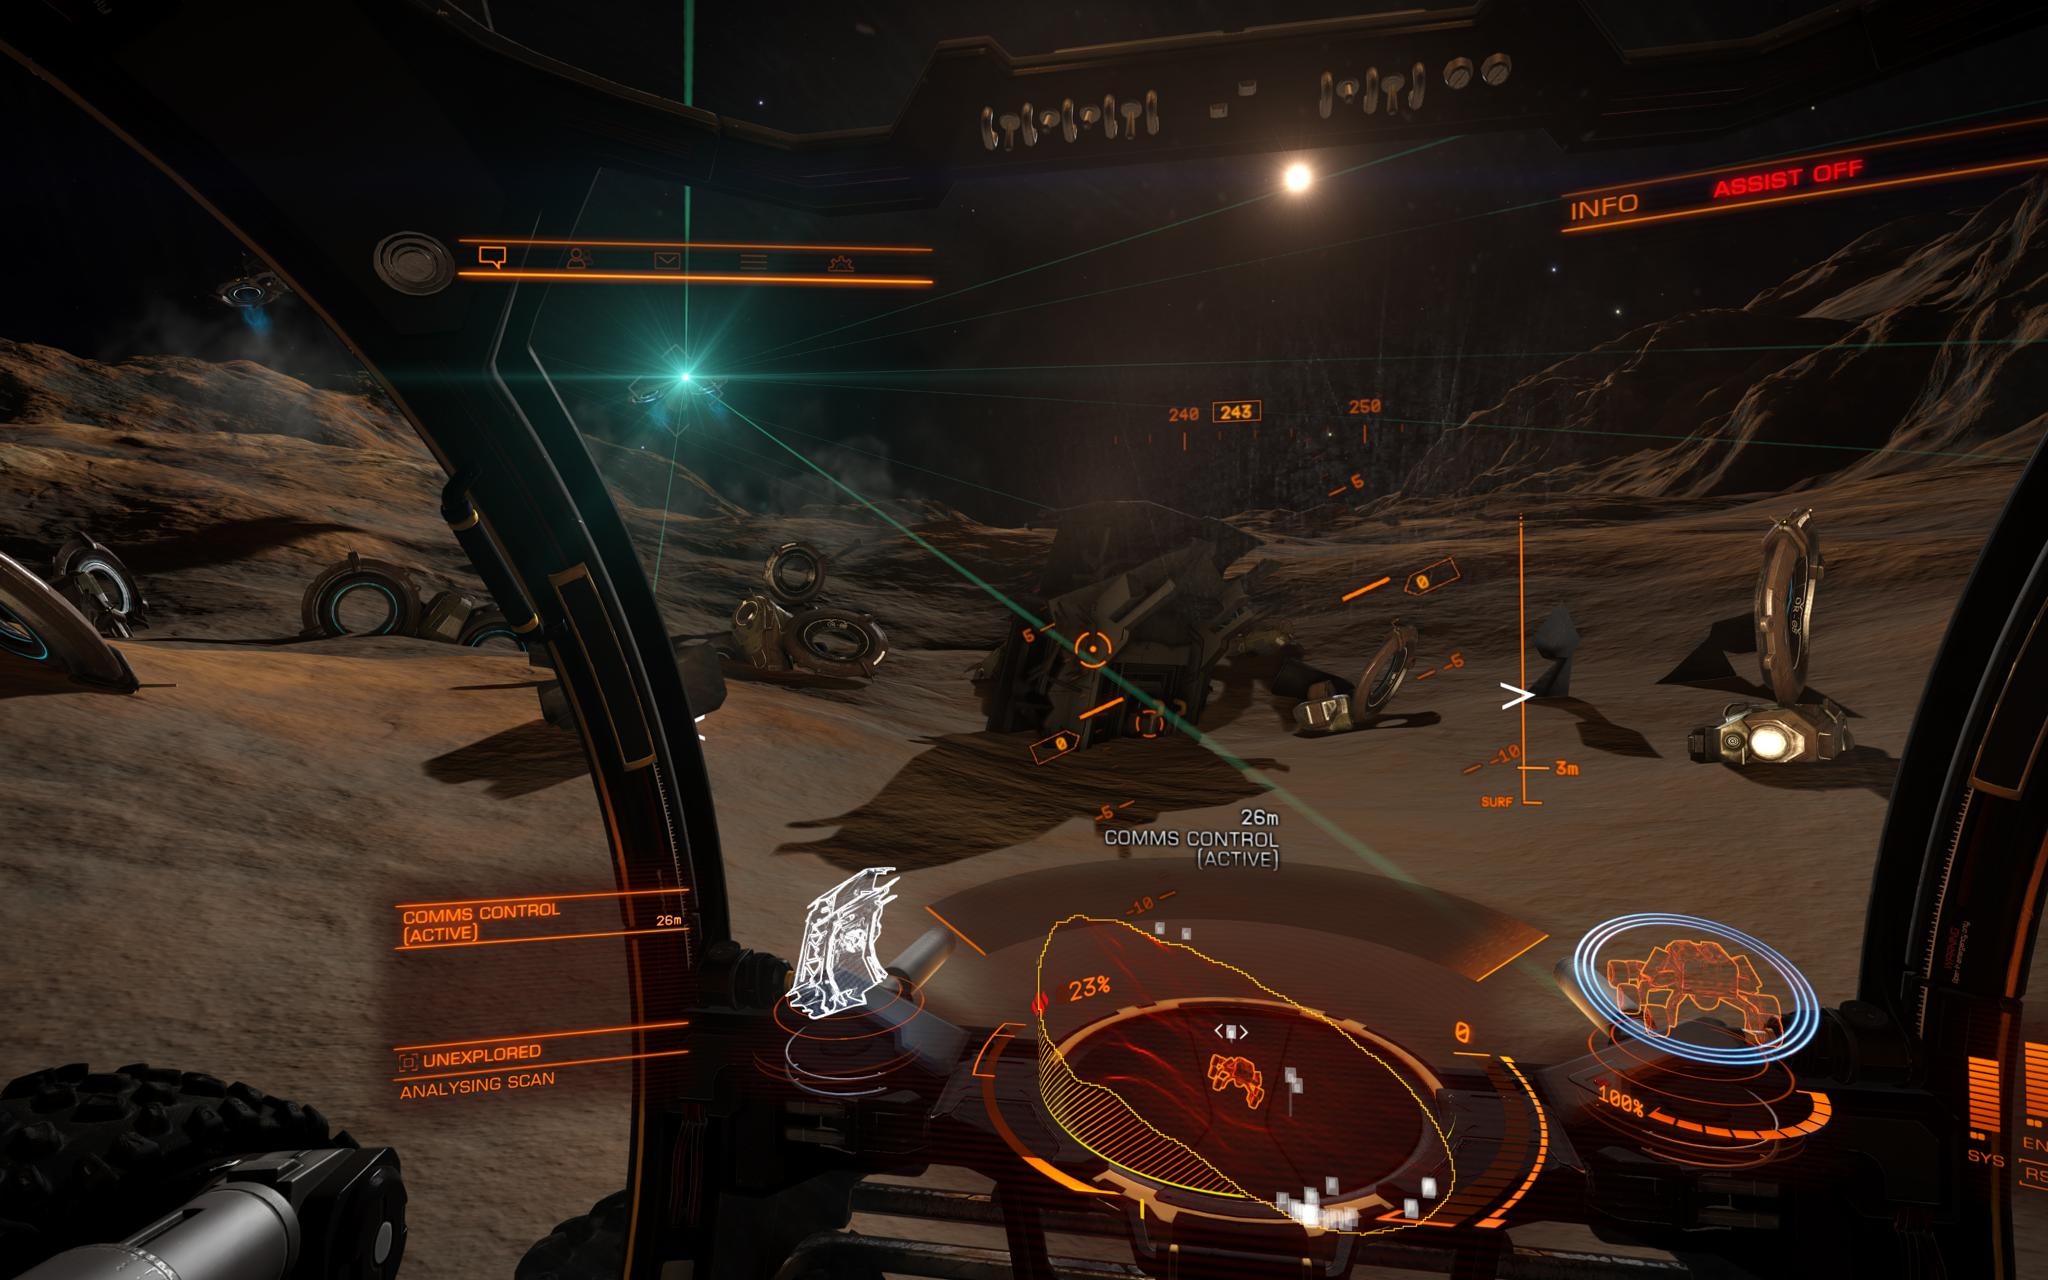 Elite: Dangerous' Horizons expansion adds planetary landings on billions of worlds | Polygon